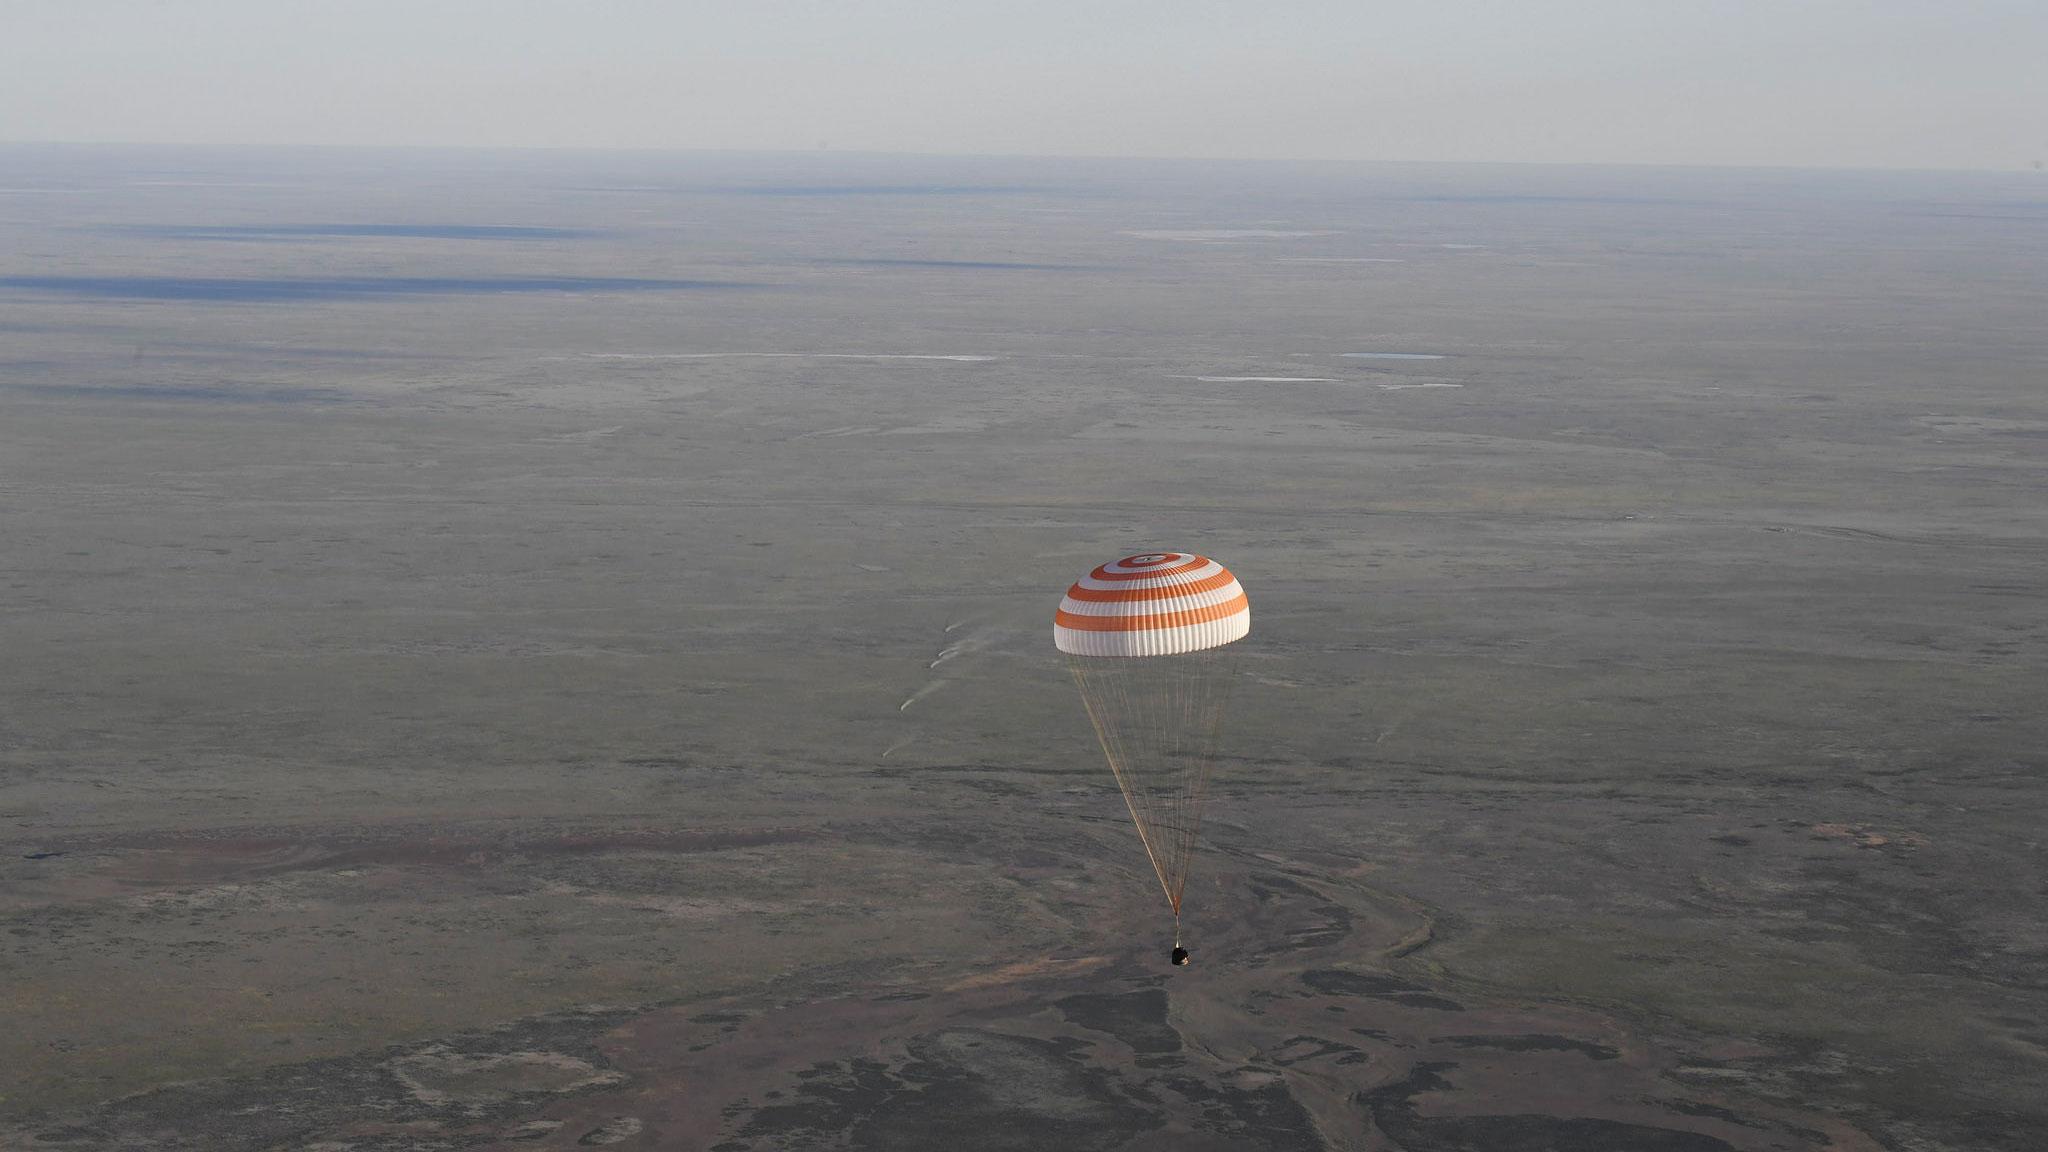 Soyuz MS-03 Landing